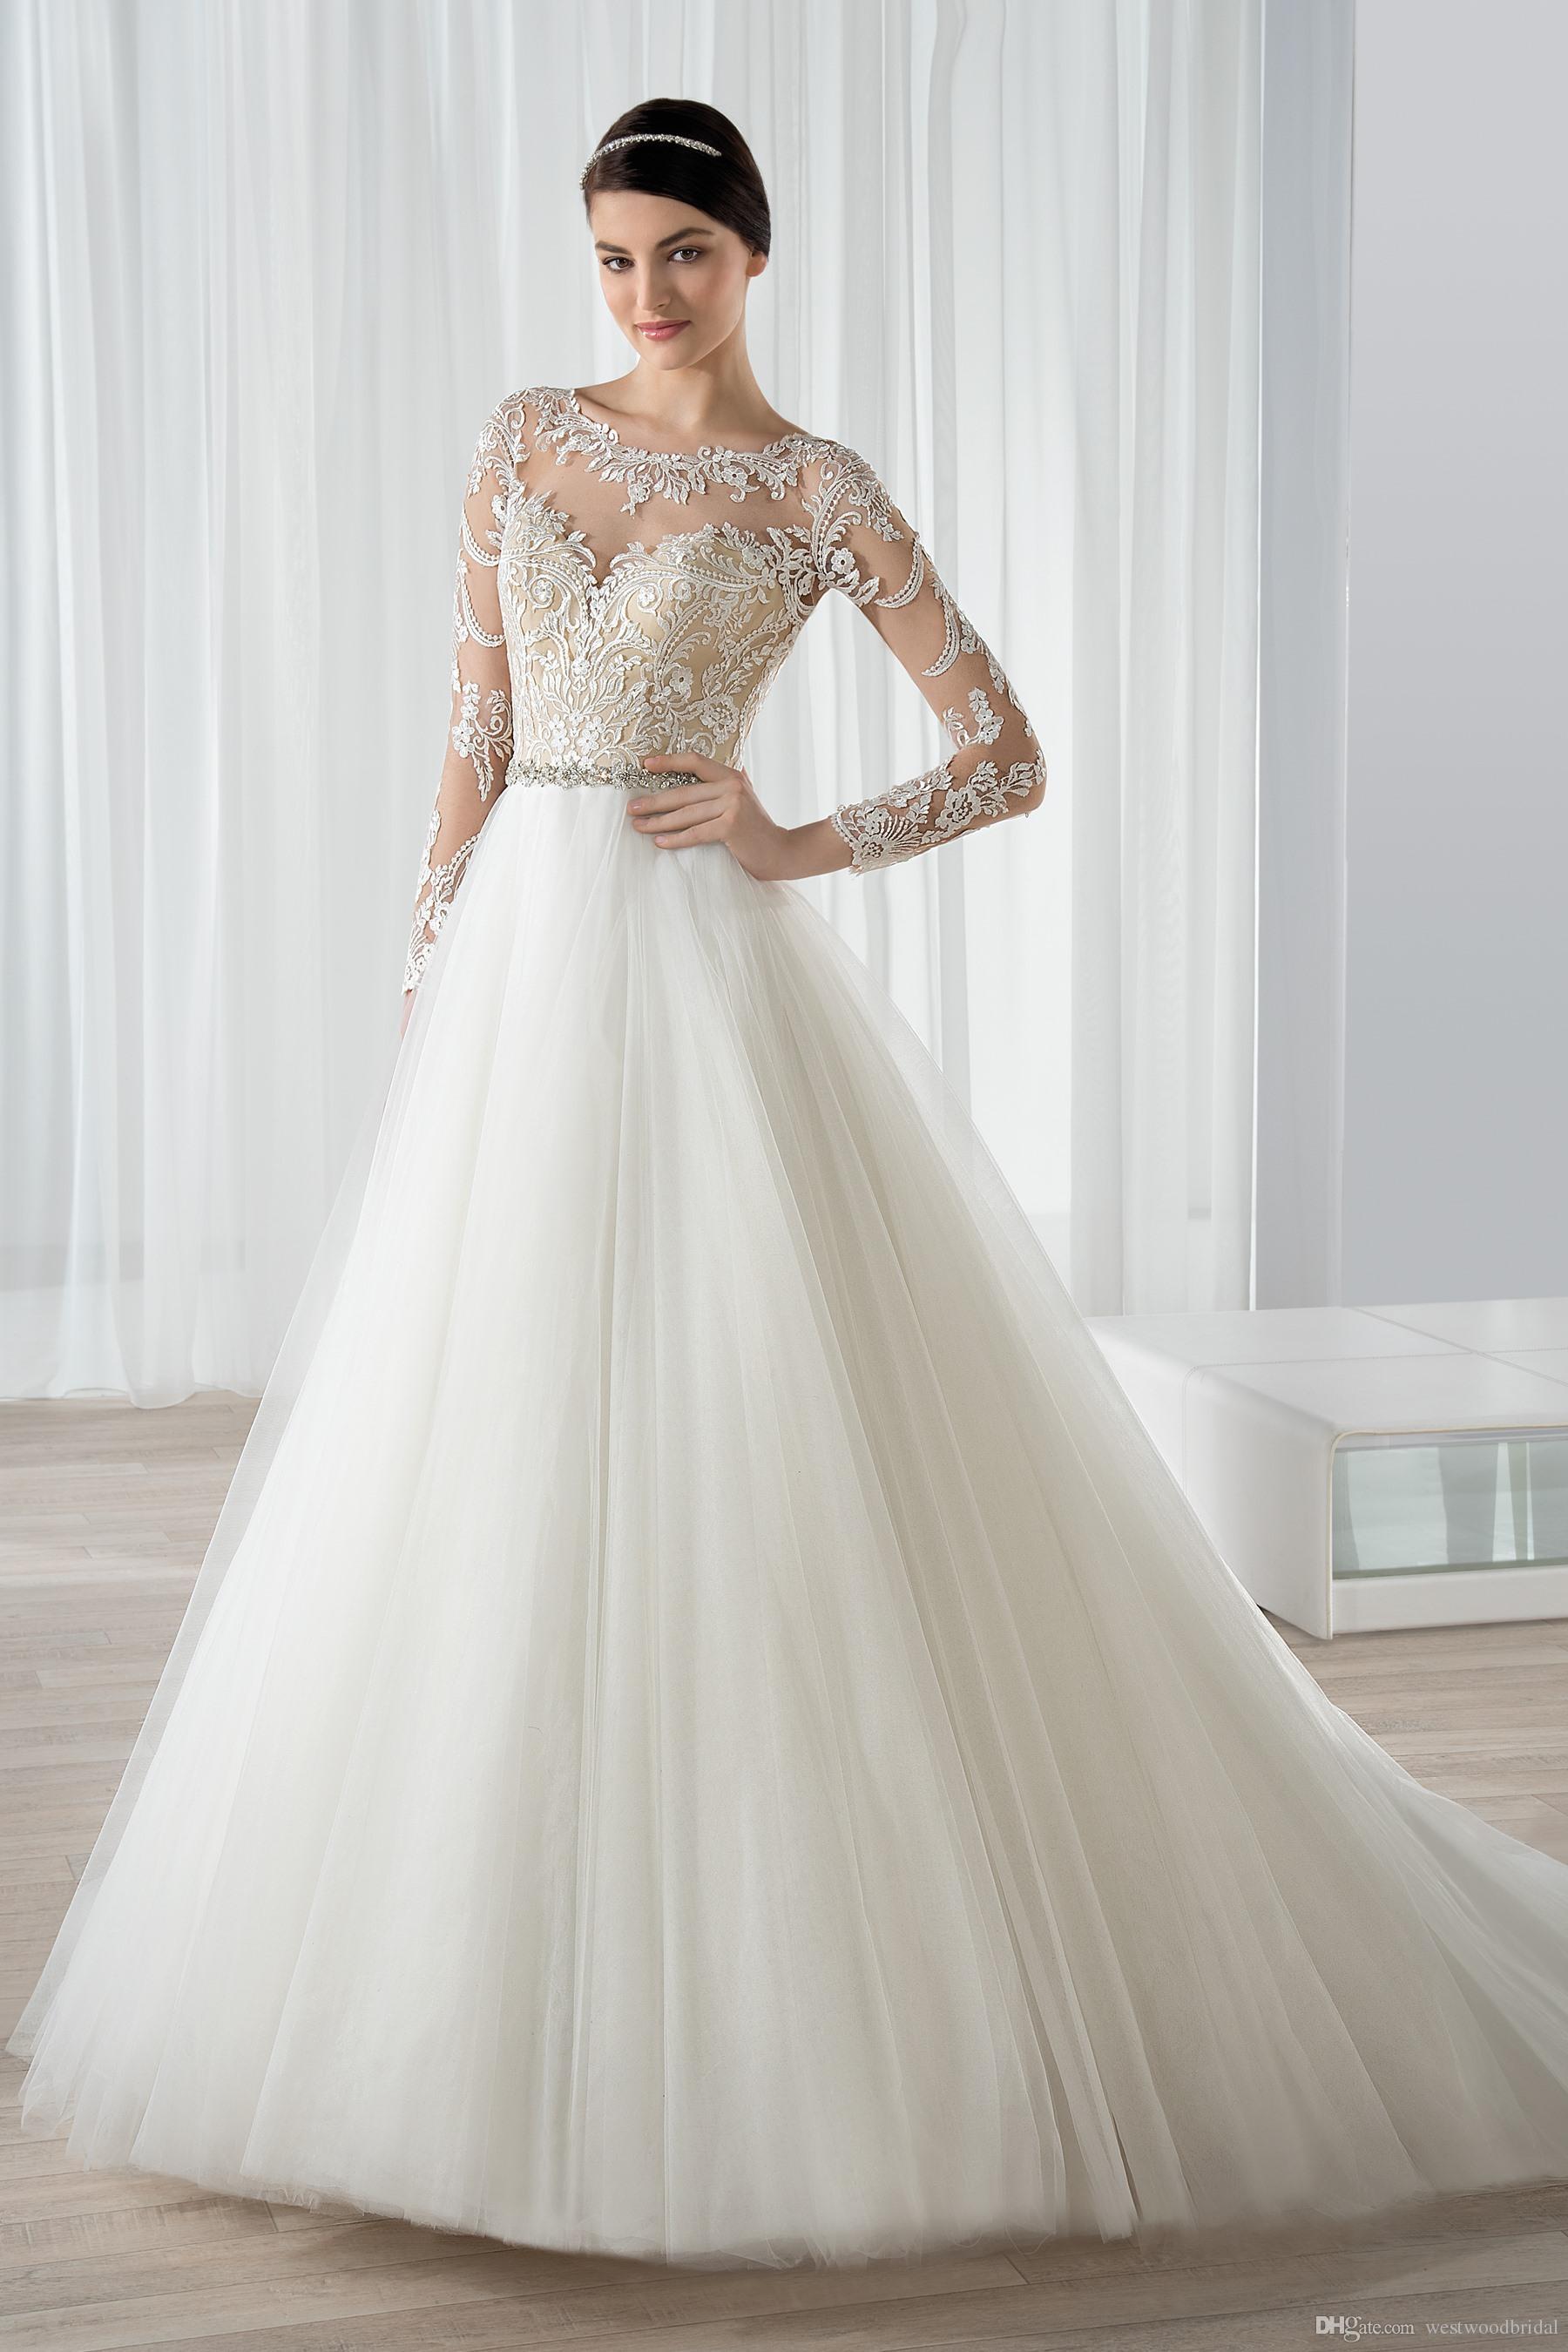 2019 Wedding Dresses Bridal Gowns Demetrios A Line Sheer Long Sleeve Applique Crystal Waistband Bateau Wedding Gowns Custom Made